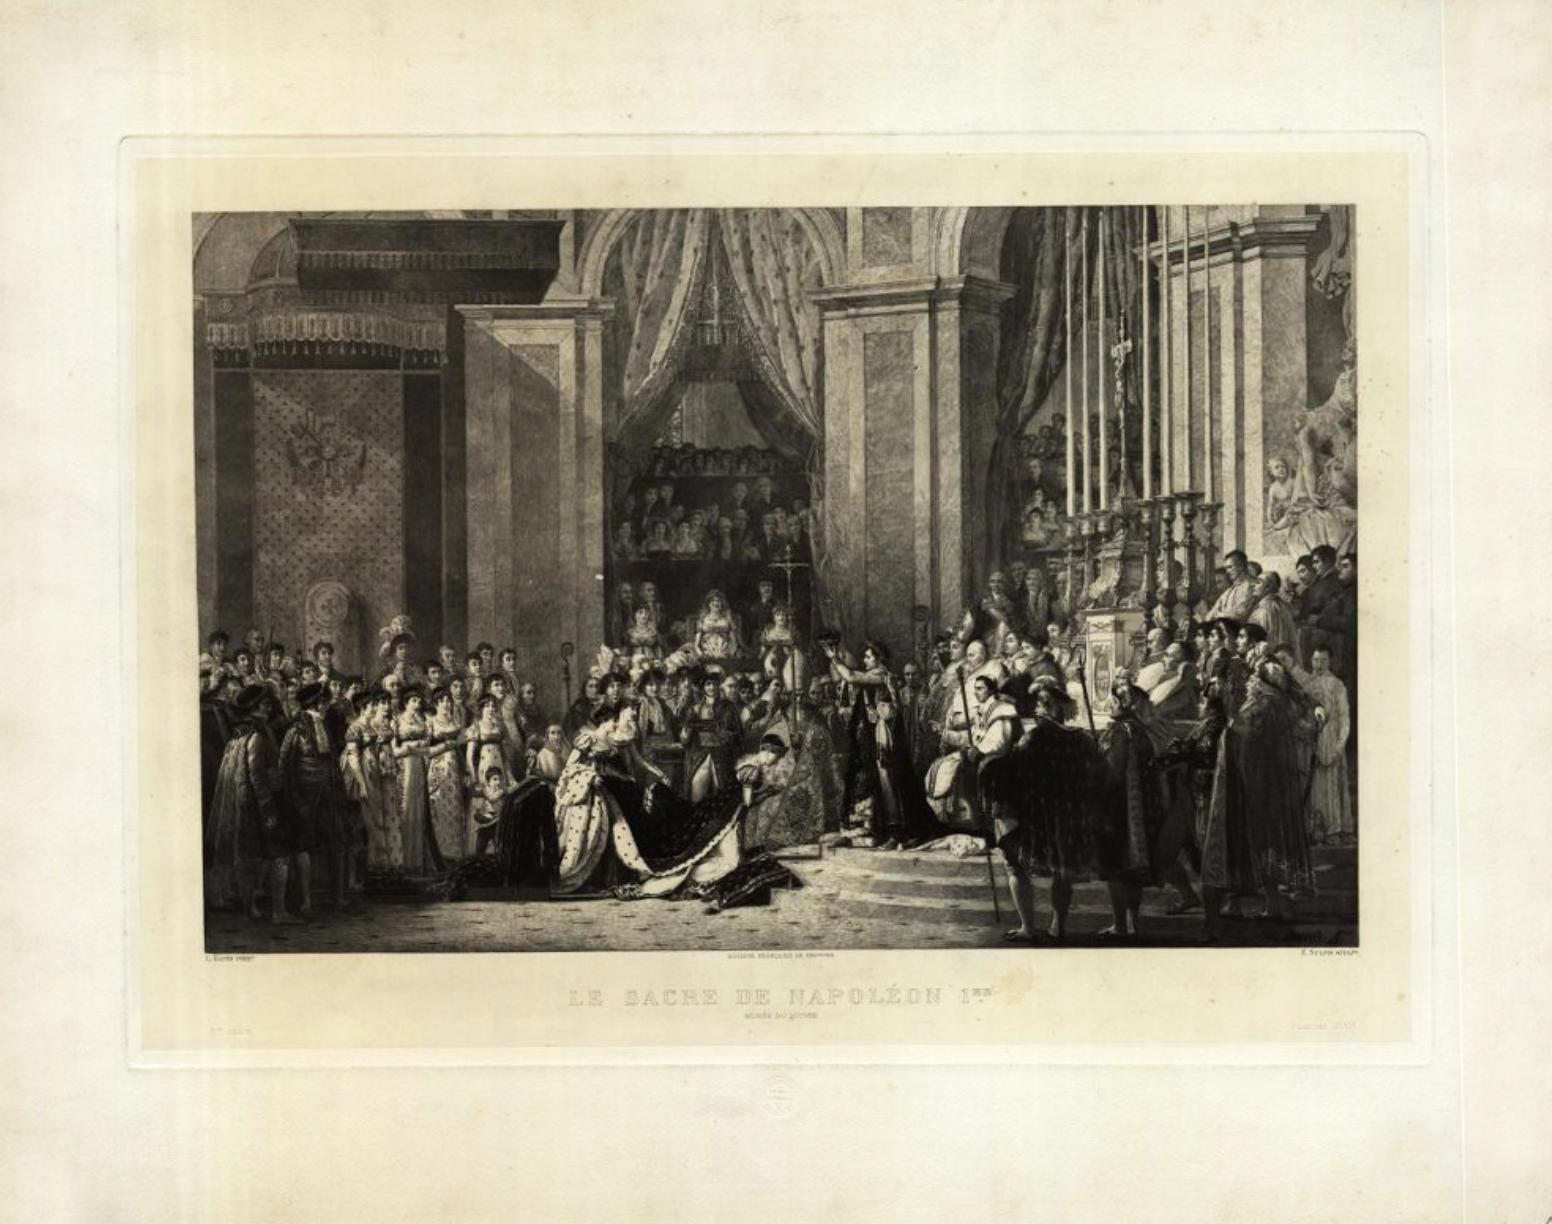 Коронация Наполеона I в Notre Dame 2 декабря 1804 года Гравюра Э.Ж. Сюльписа по живописному оригиналу Жак-Луи Давида Франция, 1911 Дар музеев Лувра